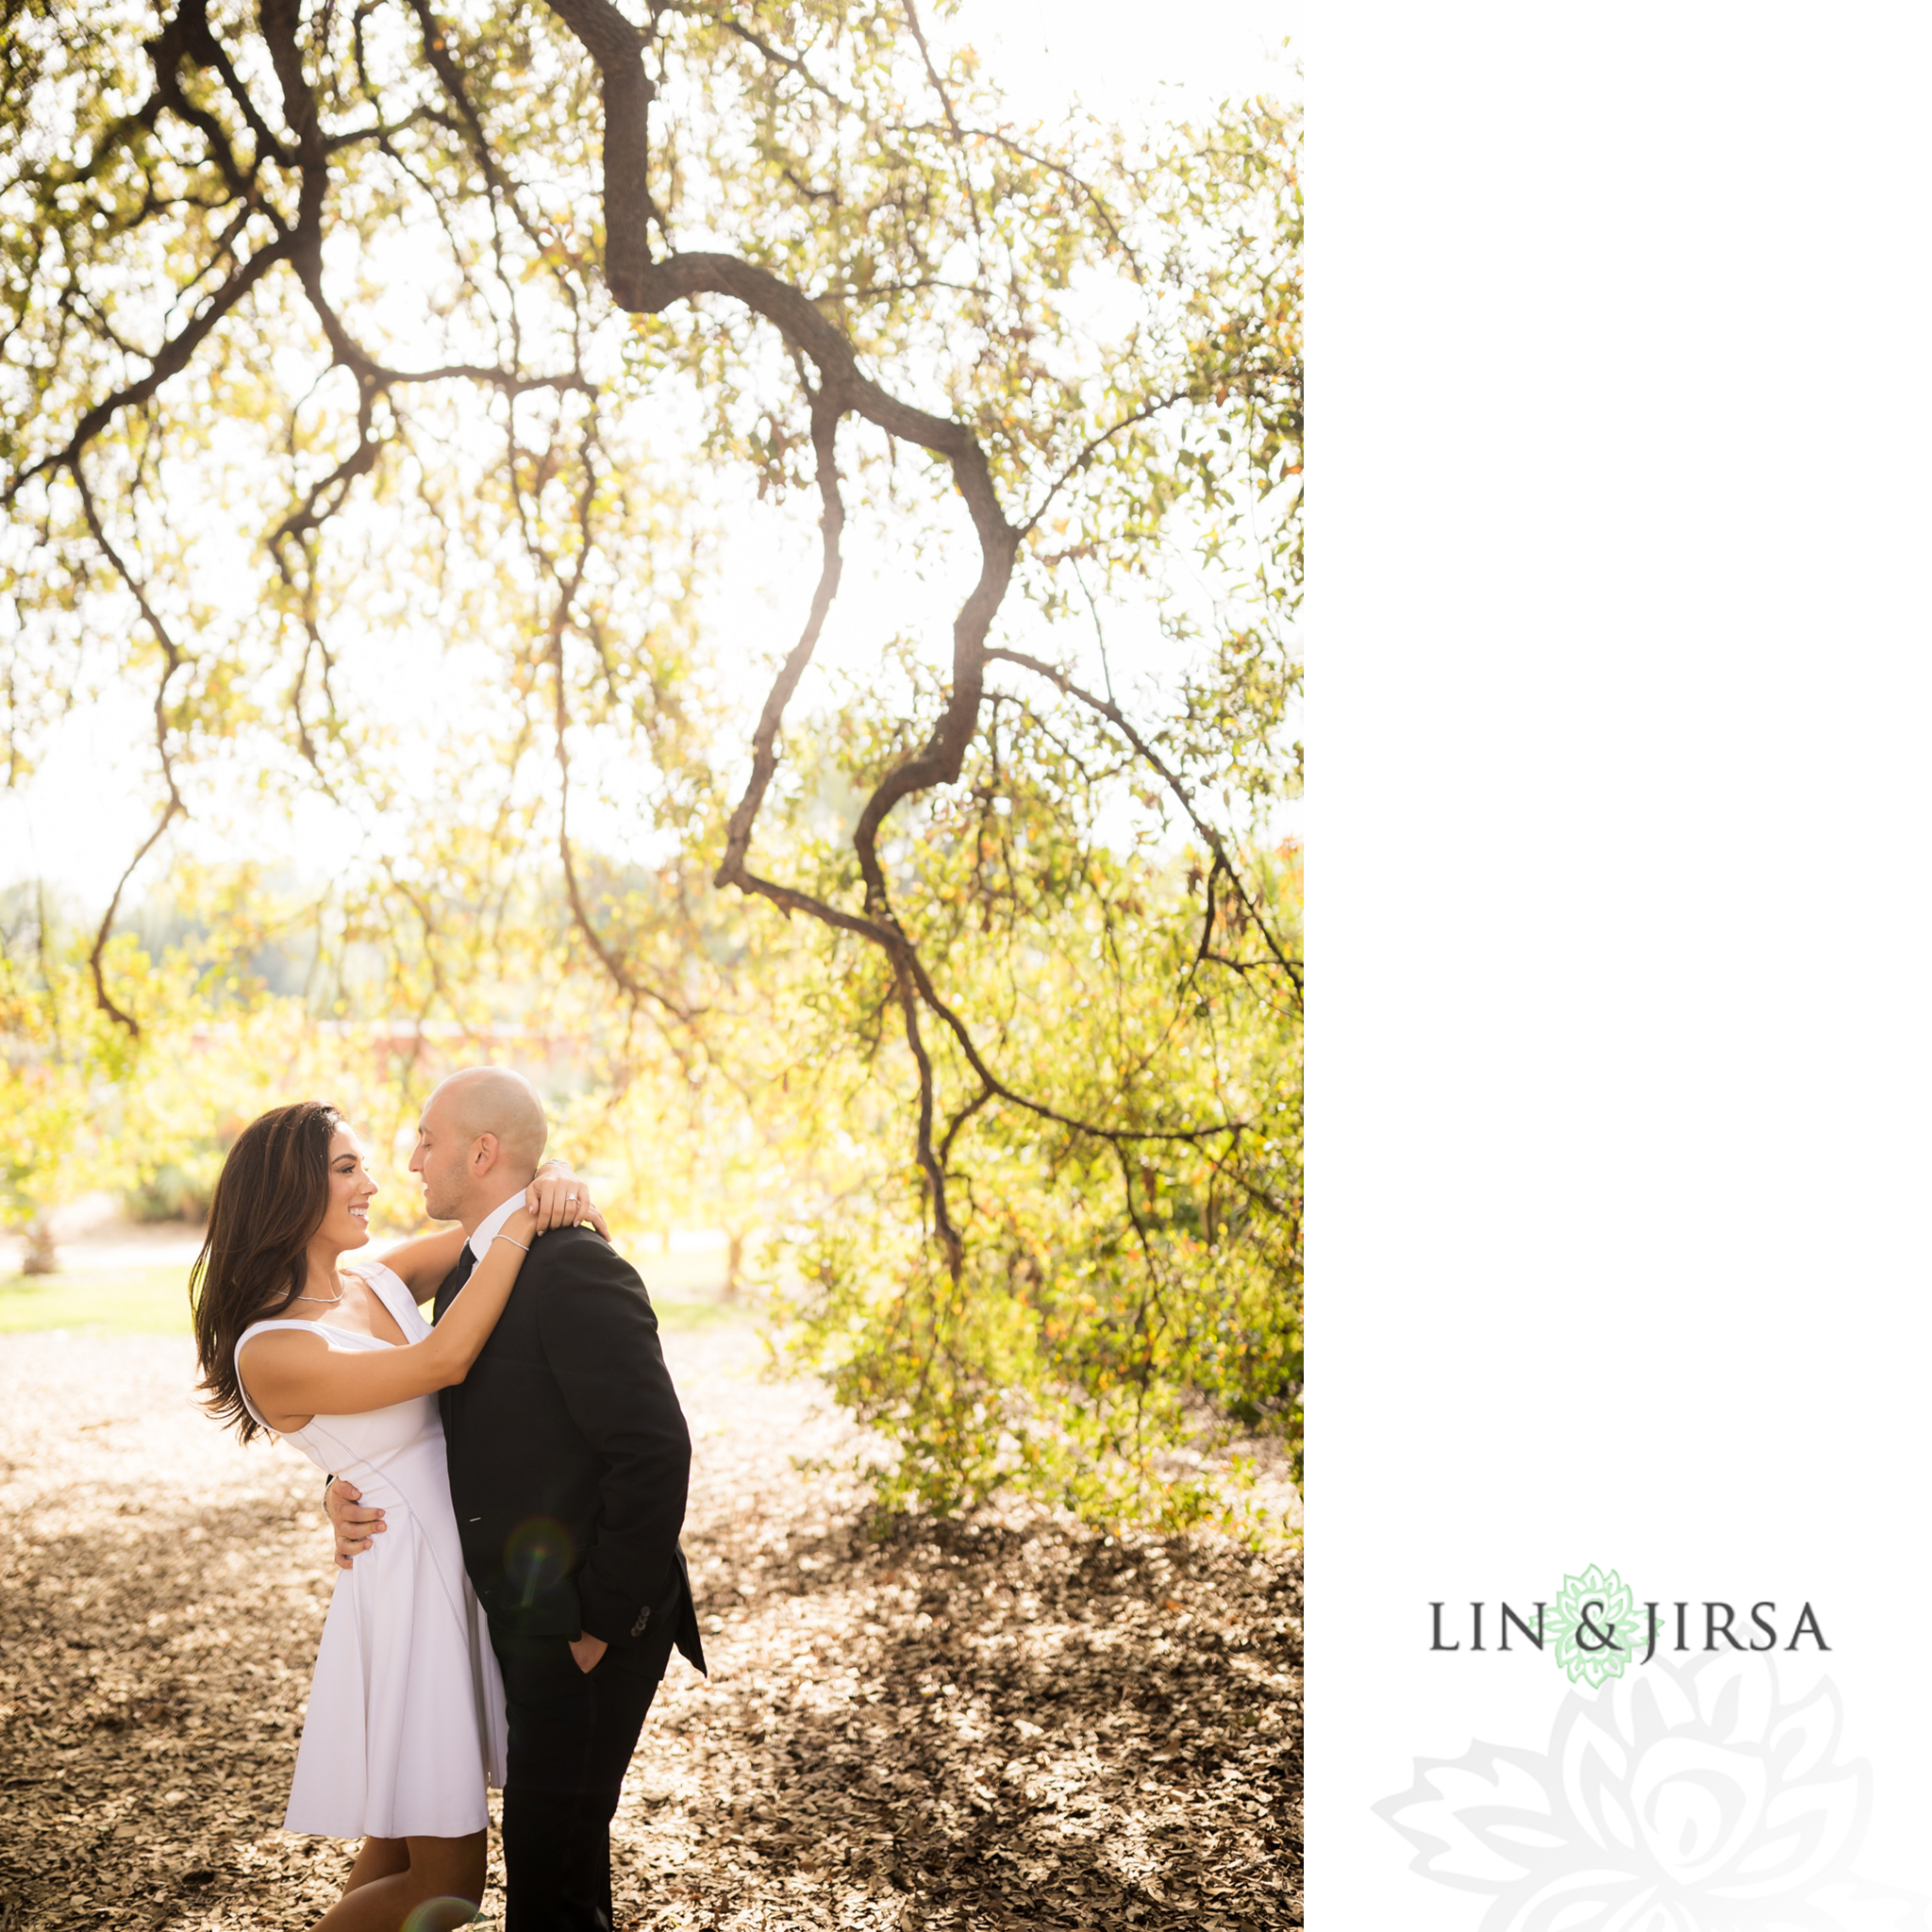 05-Los-angeles-arboretum-engagement-photography